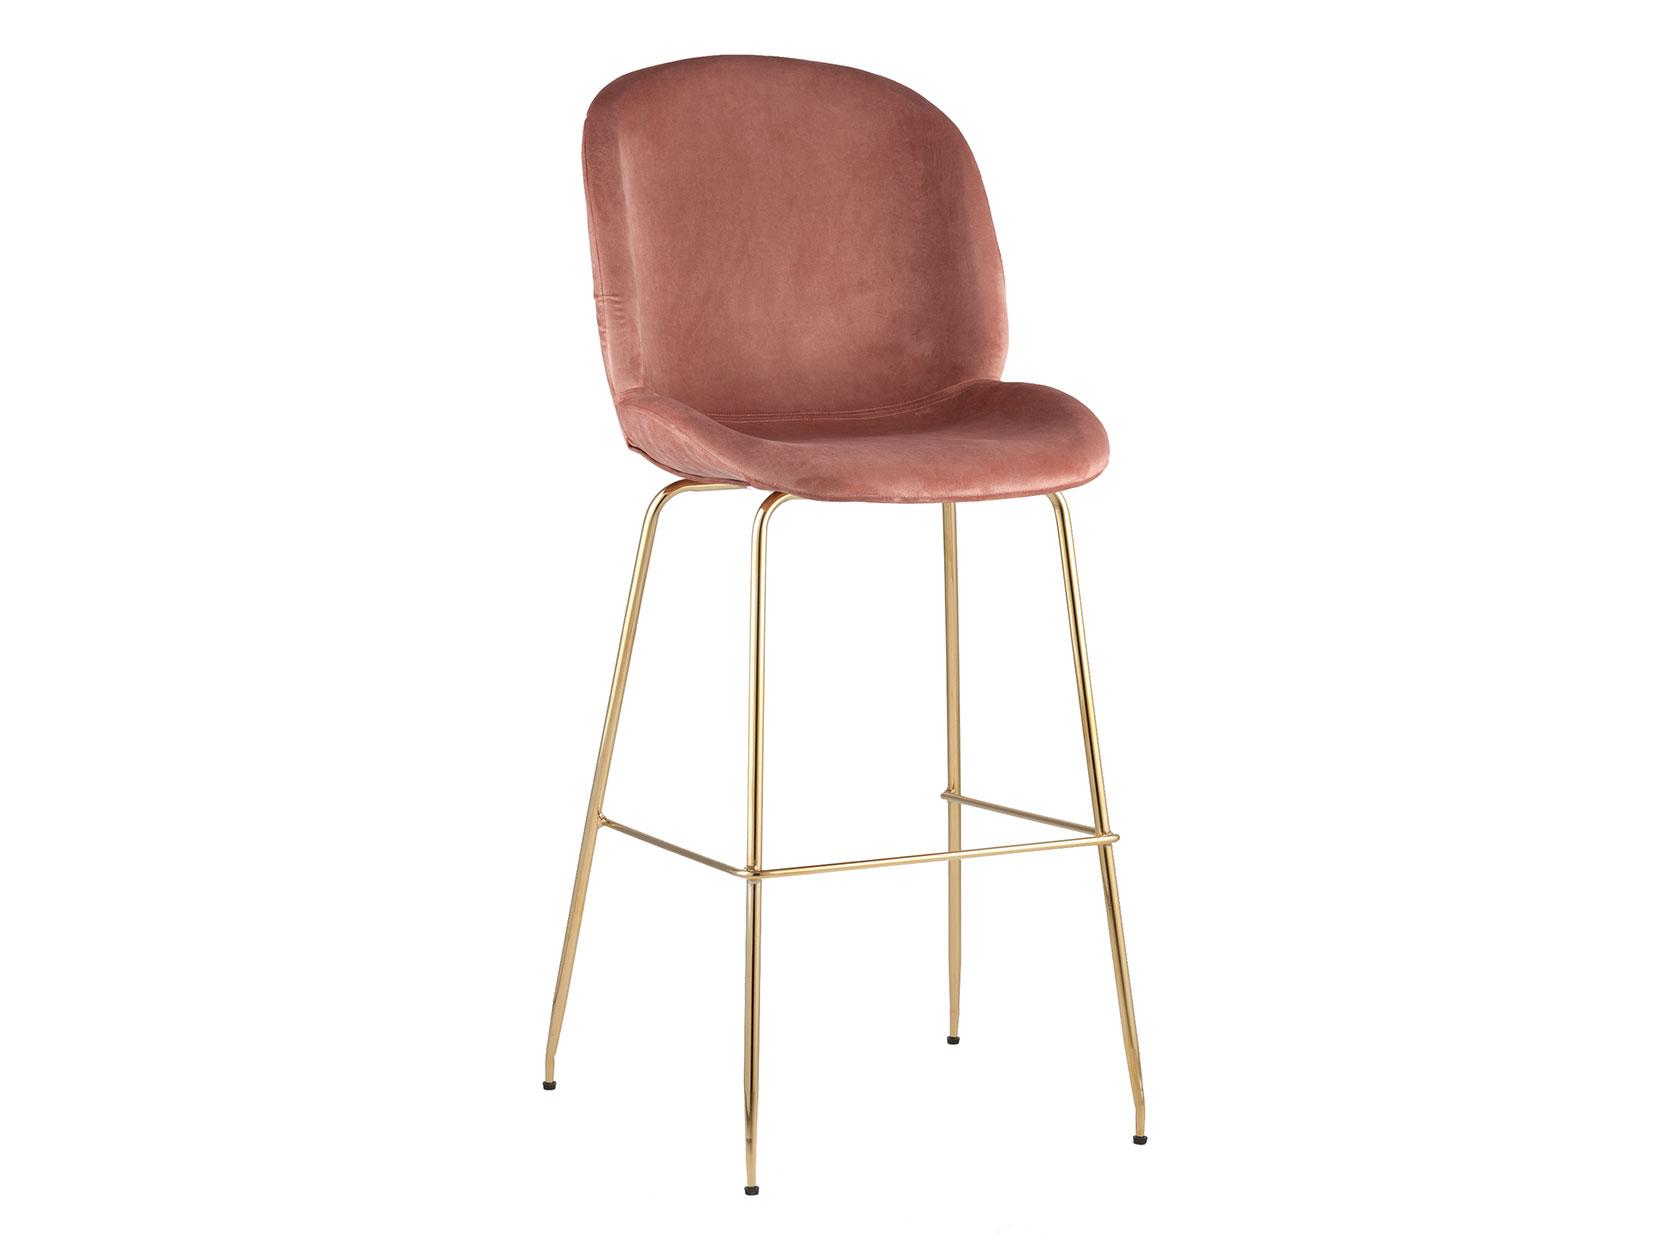 Барный стул STOOL GROUP Турин, золотистый/розовый